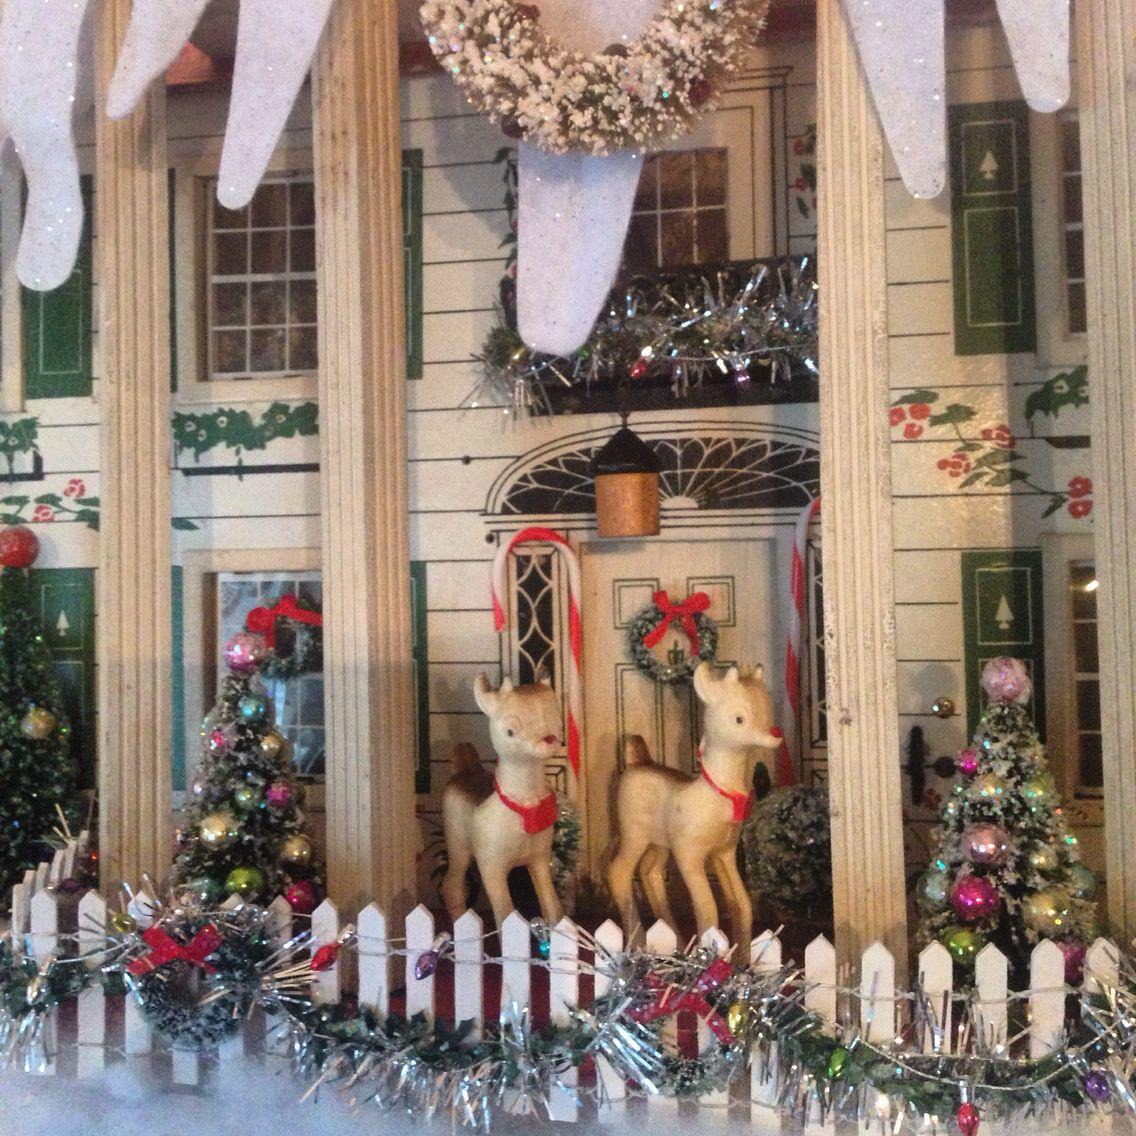 Christmas Dollhouse Decorations.My Christmas Decorations Only Plantation Dollhouse